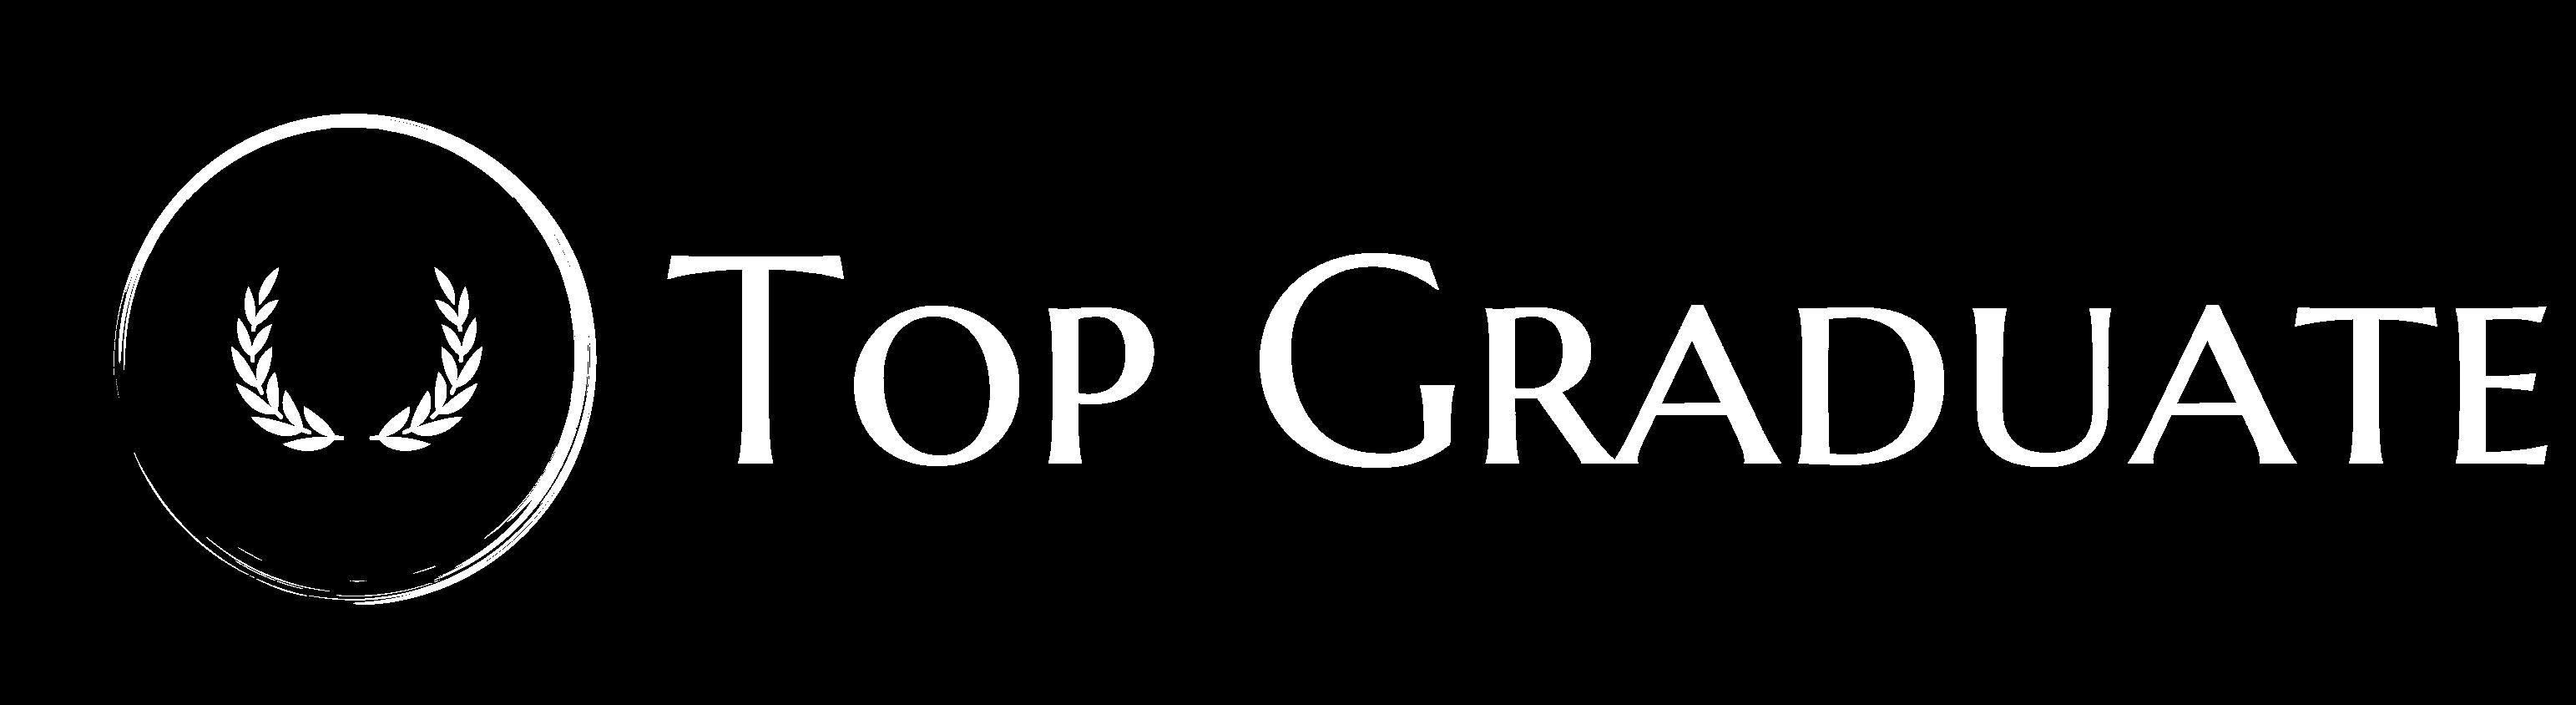 Top Graduate Help Center